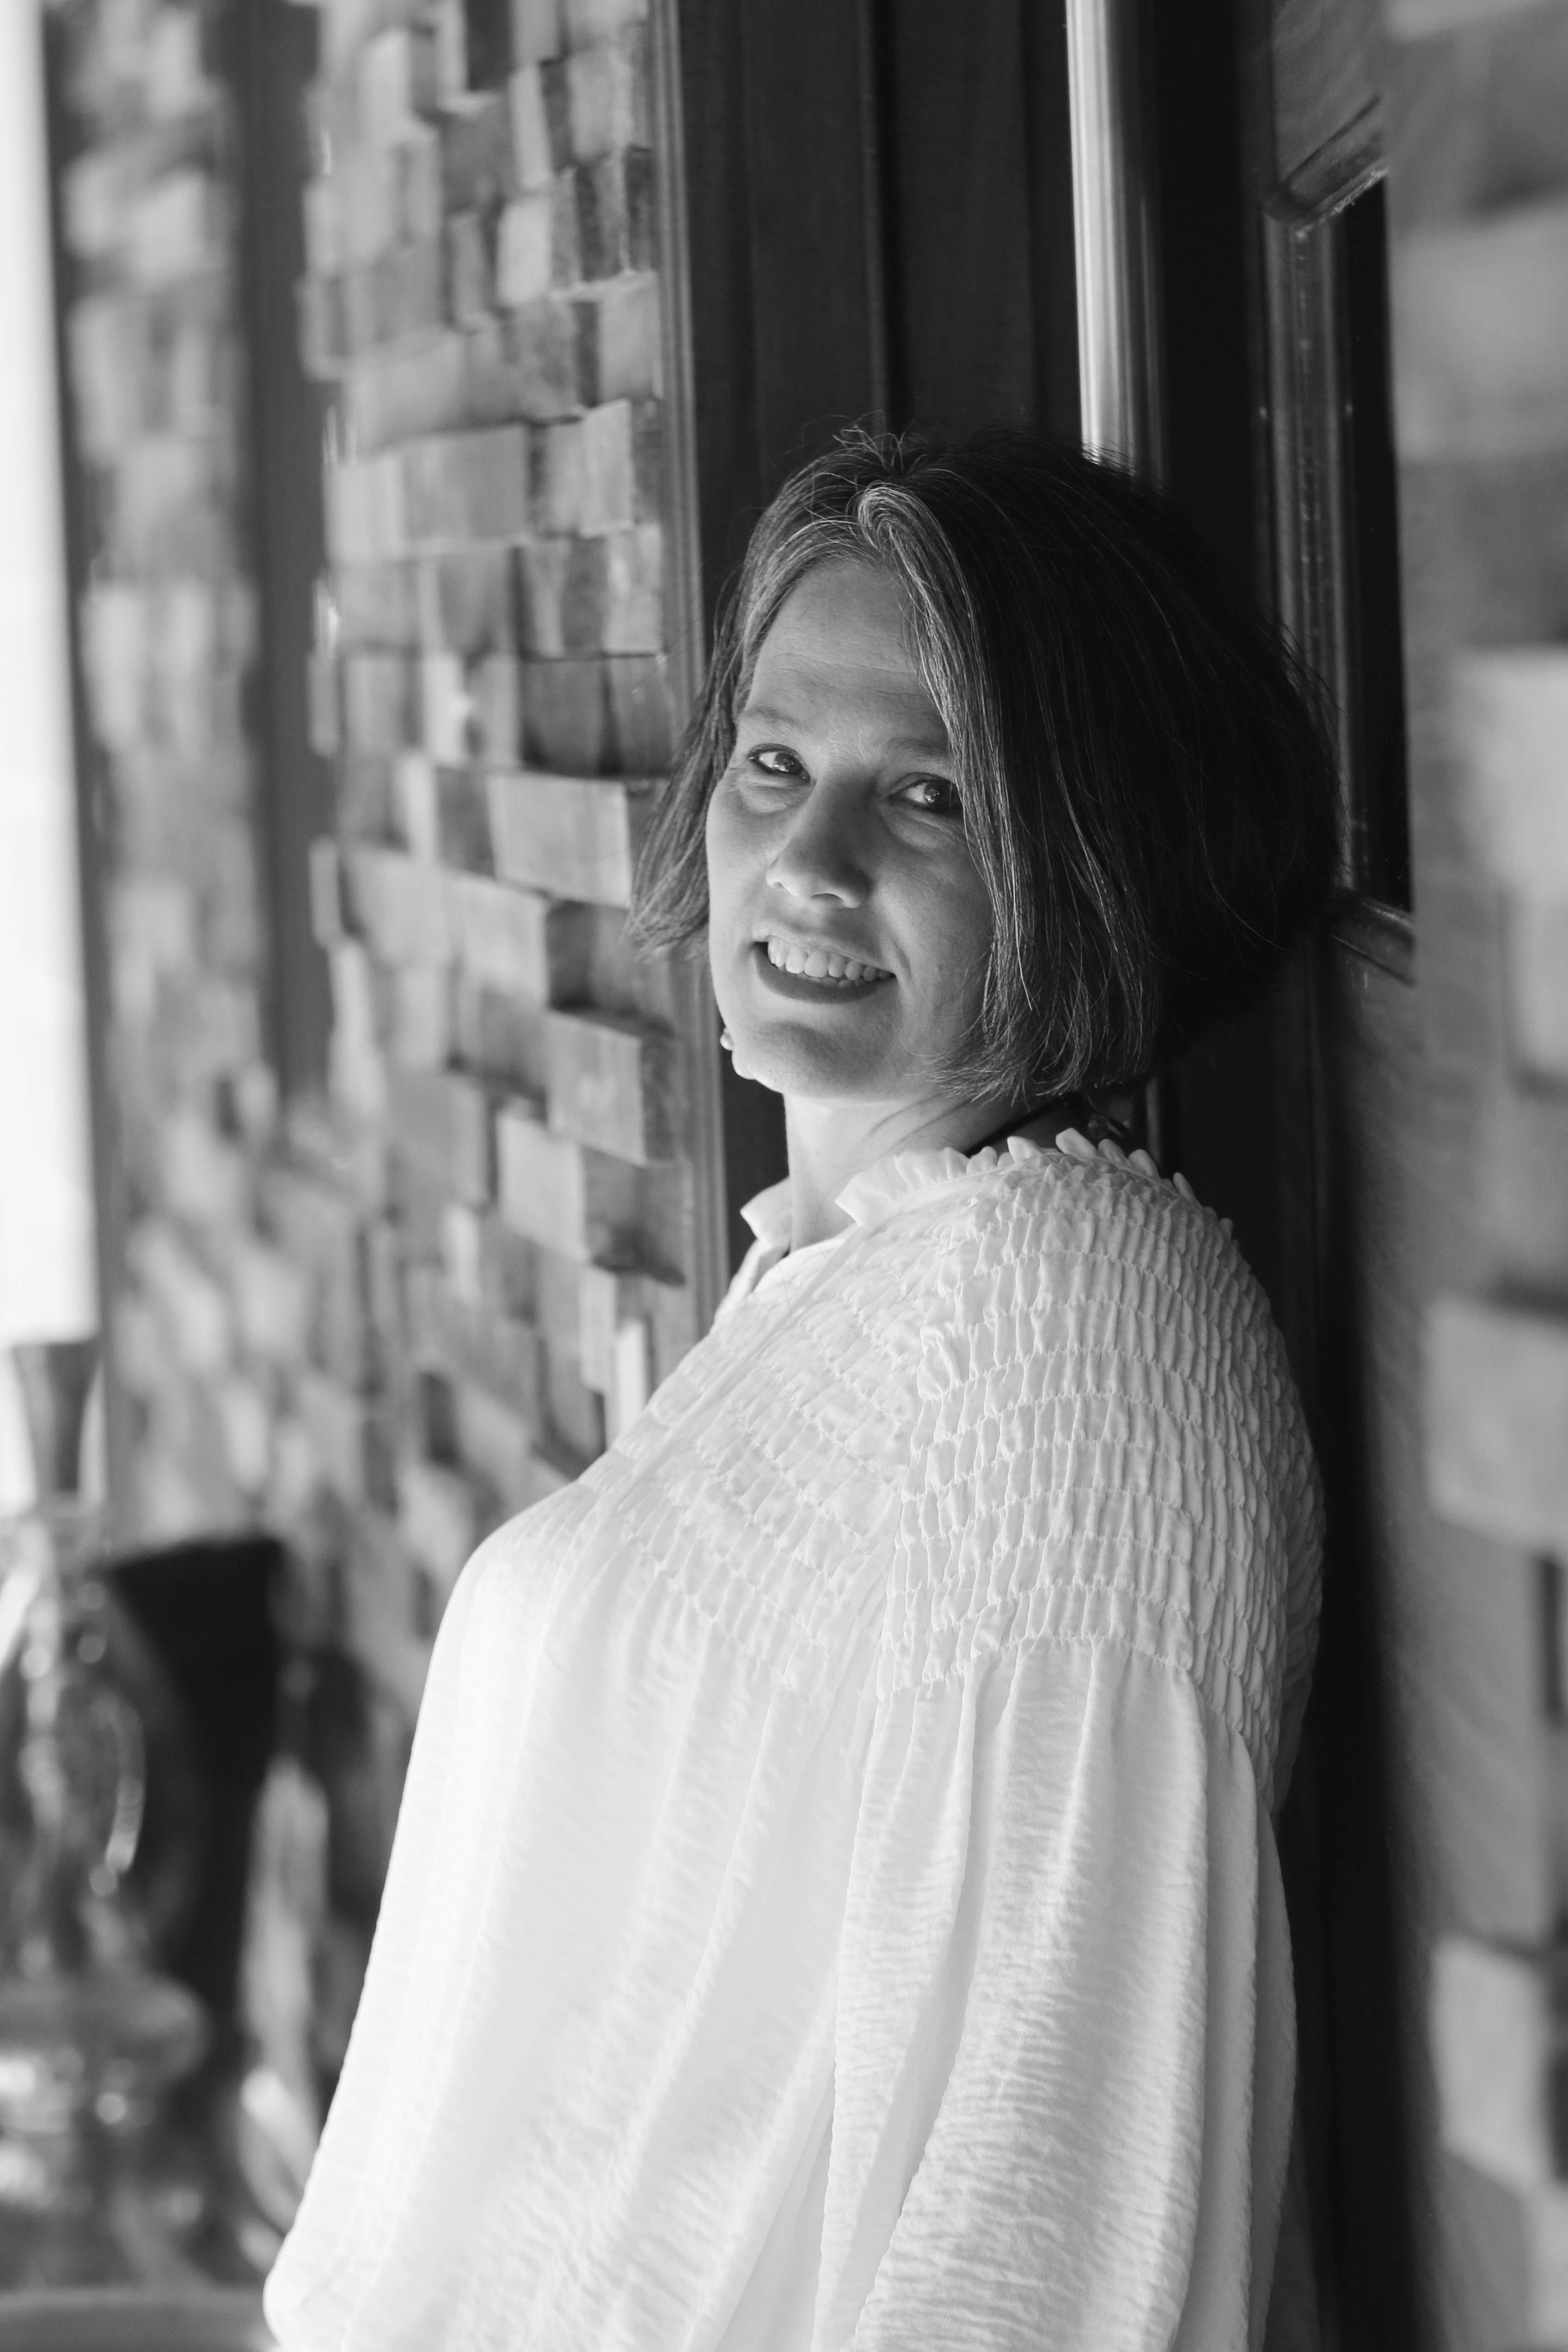 Author, Trainer, Implementer